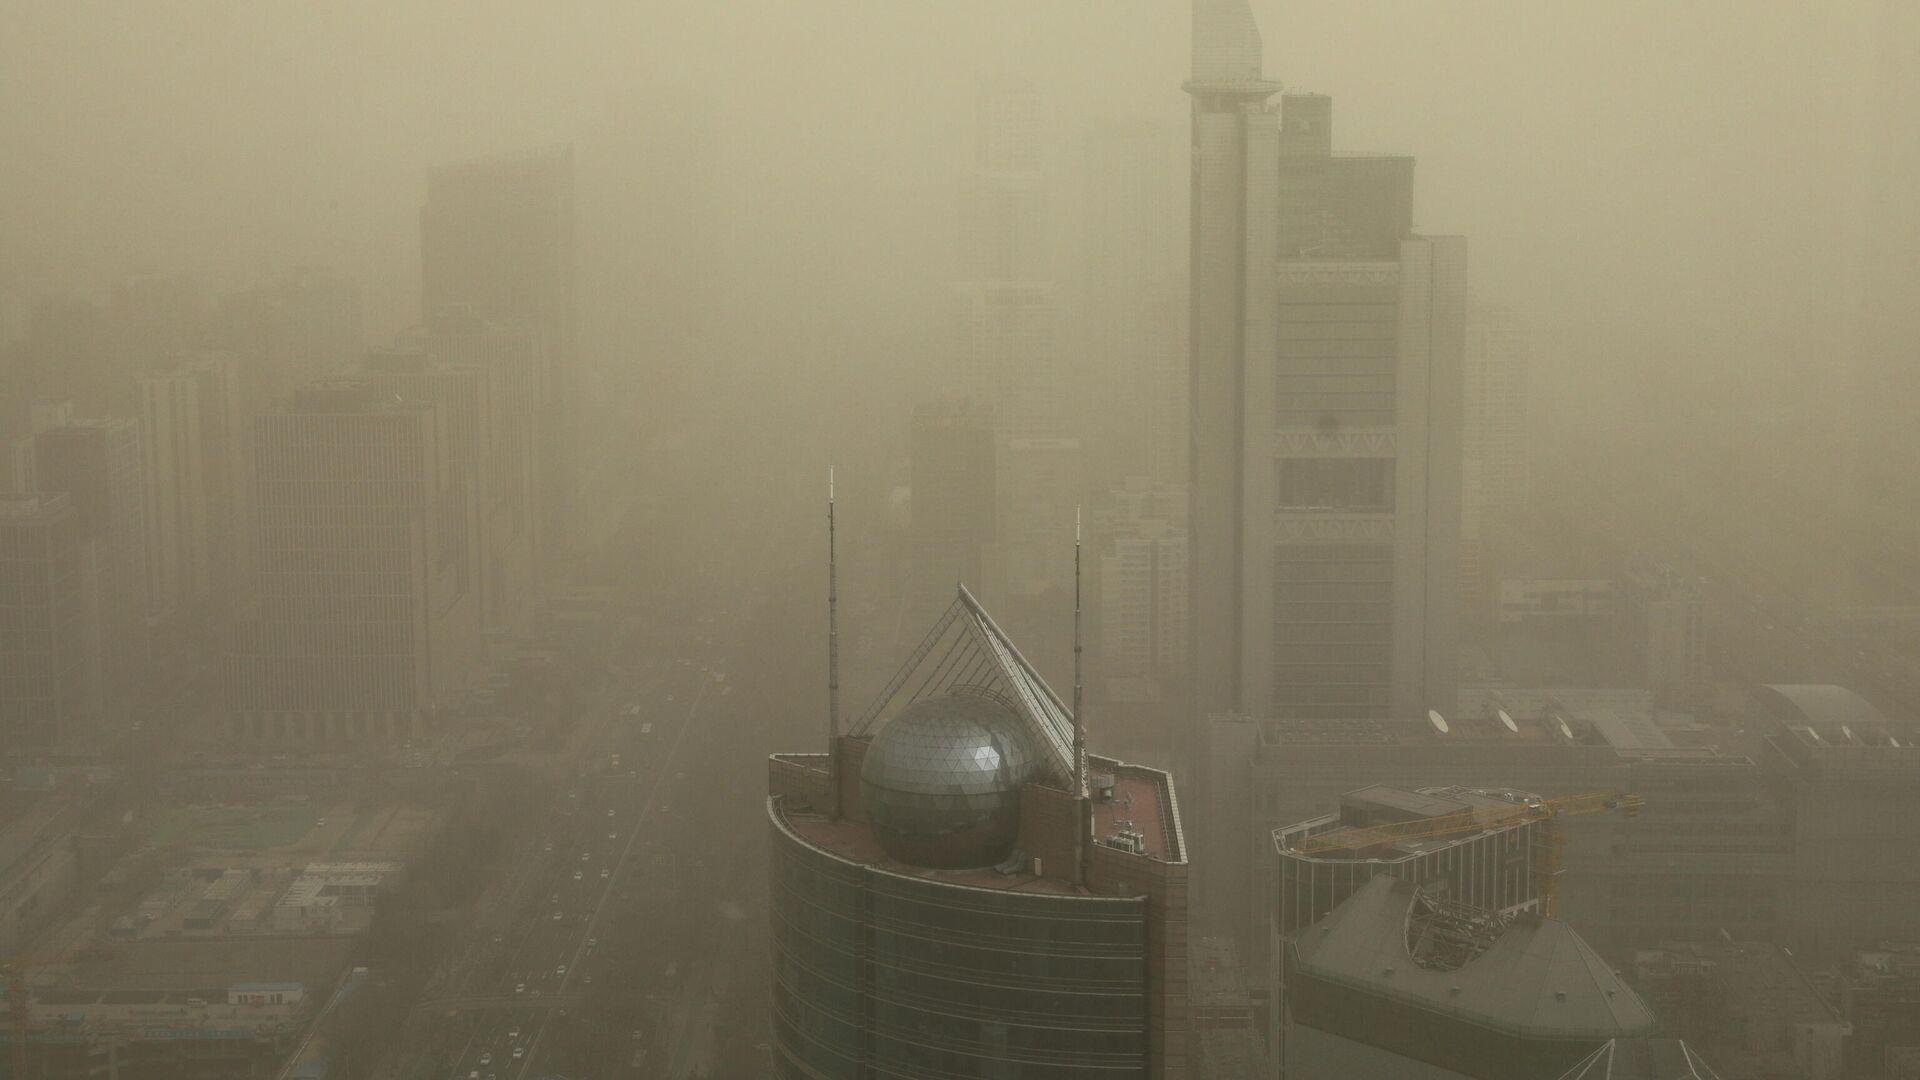 Una tormenta de arena en Pekín, China - Sputnik Mundo, 1920, 15.03.2021